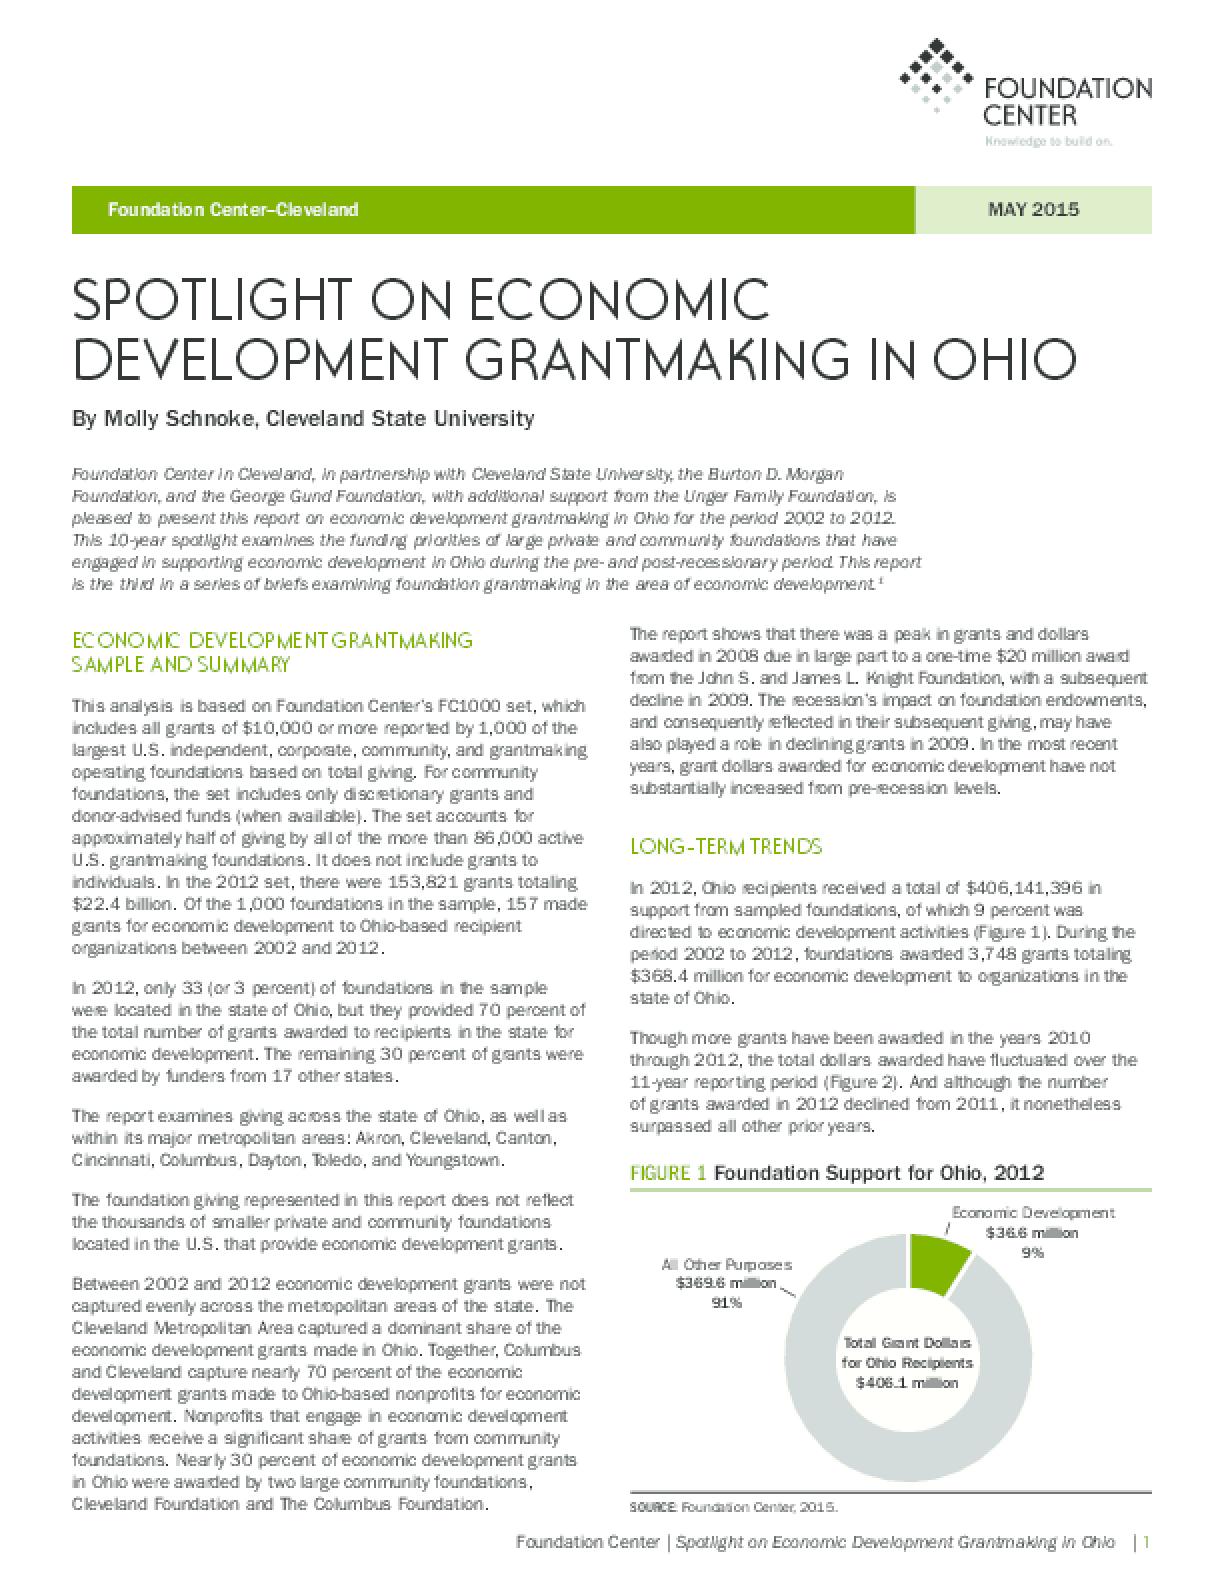 Spotlight on Economic Development Grantmaking in Ohio May 2015